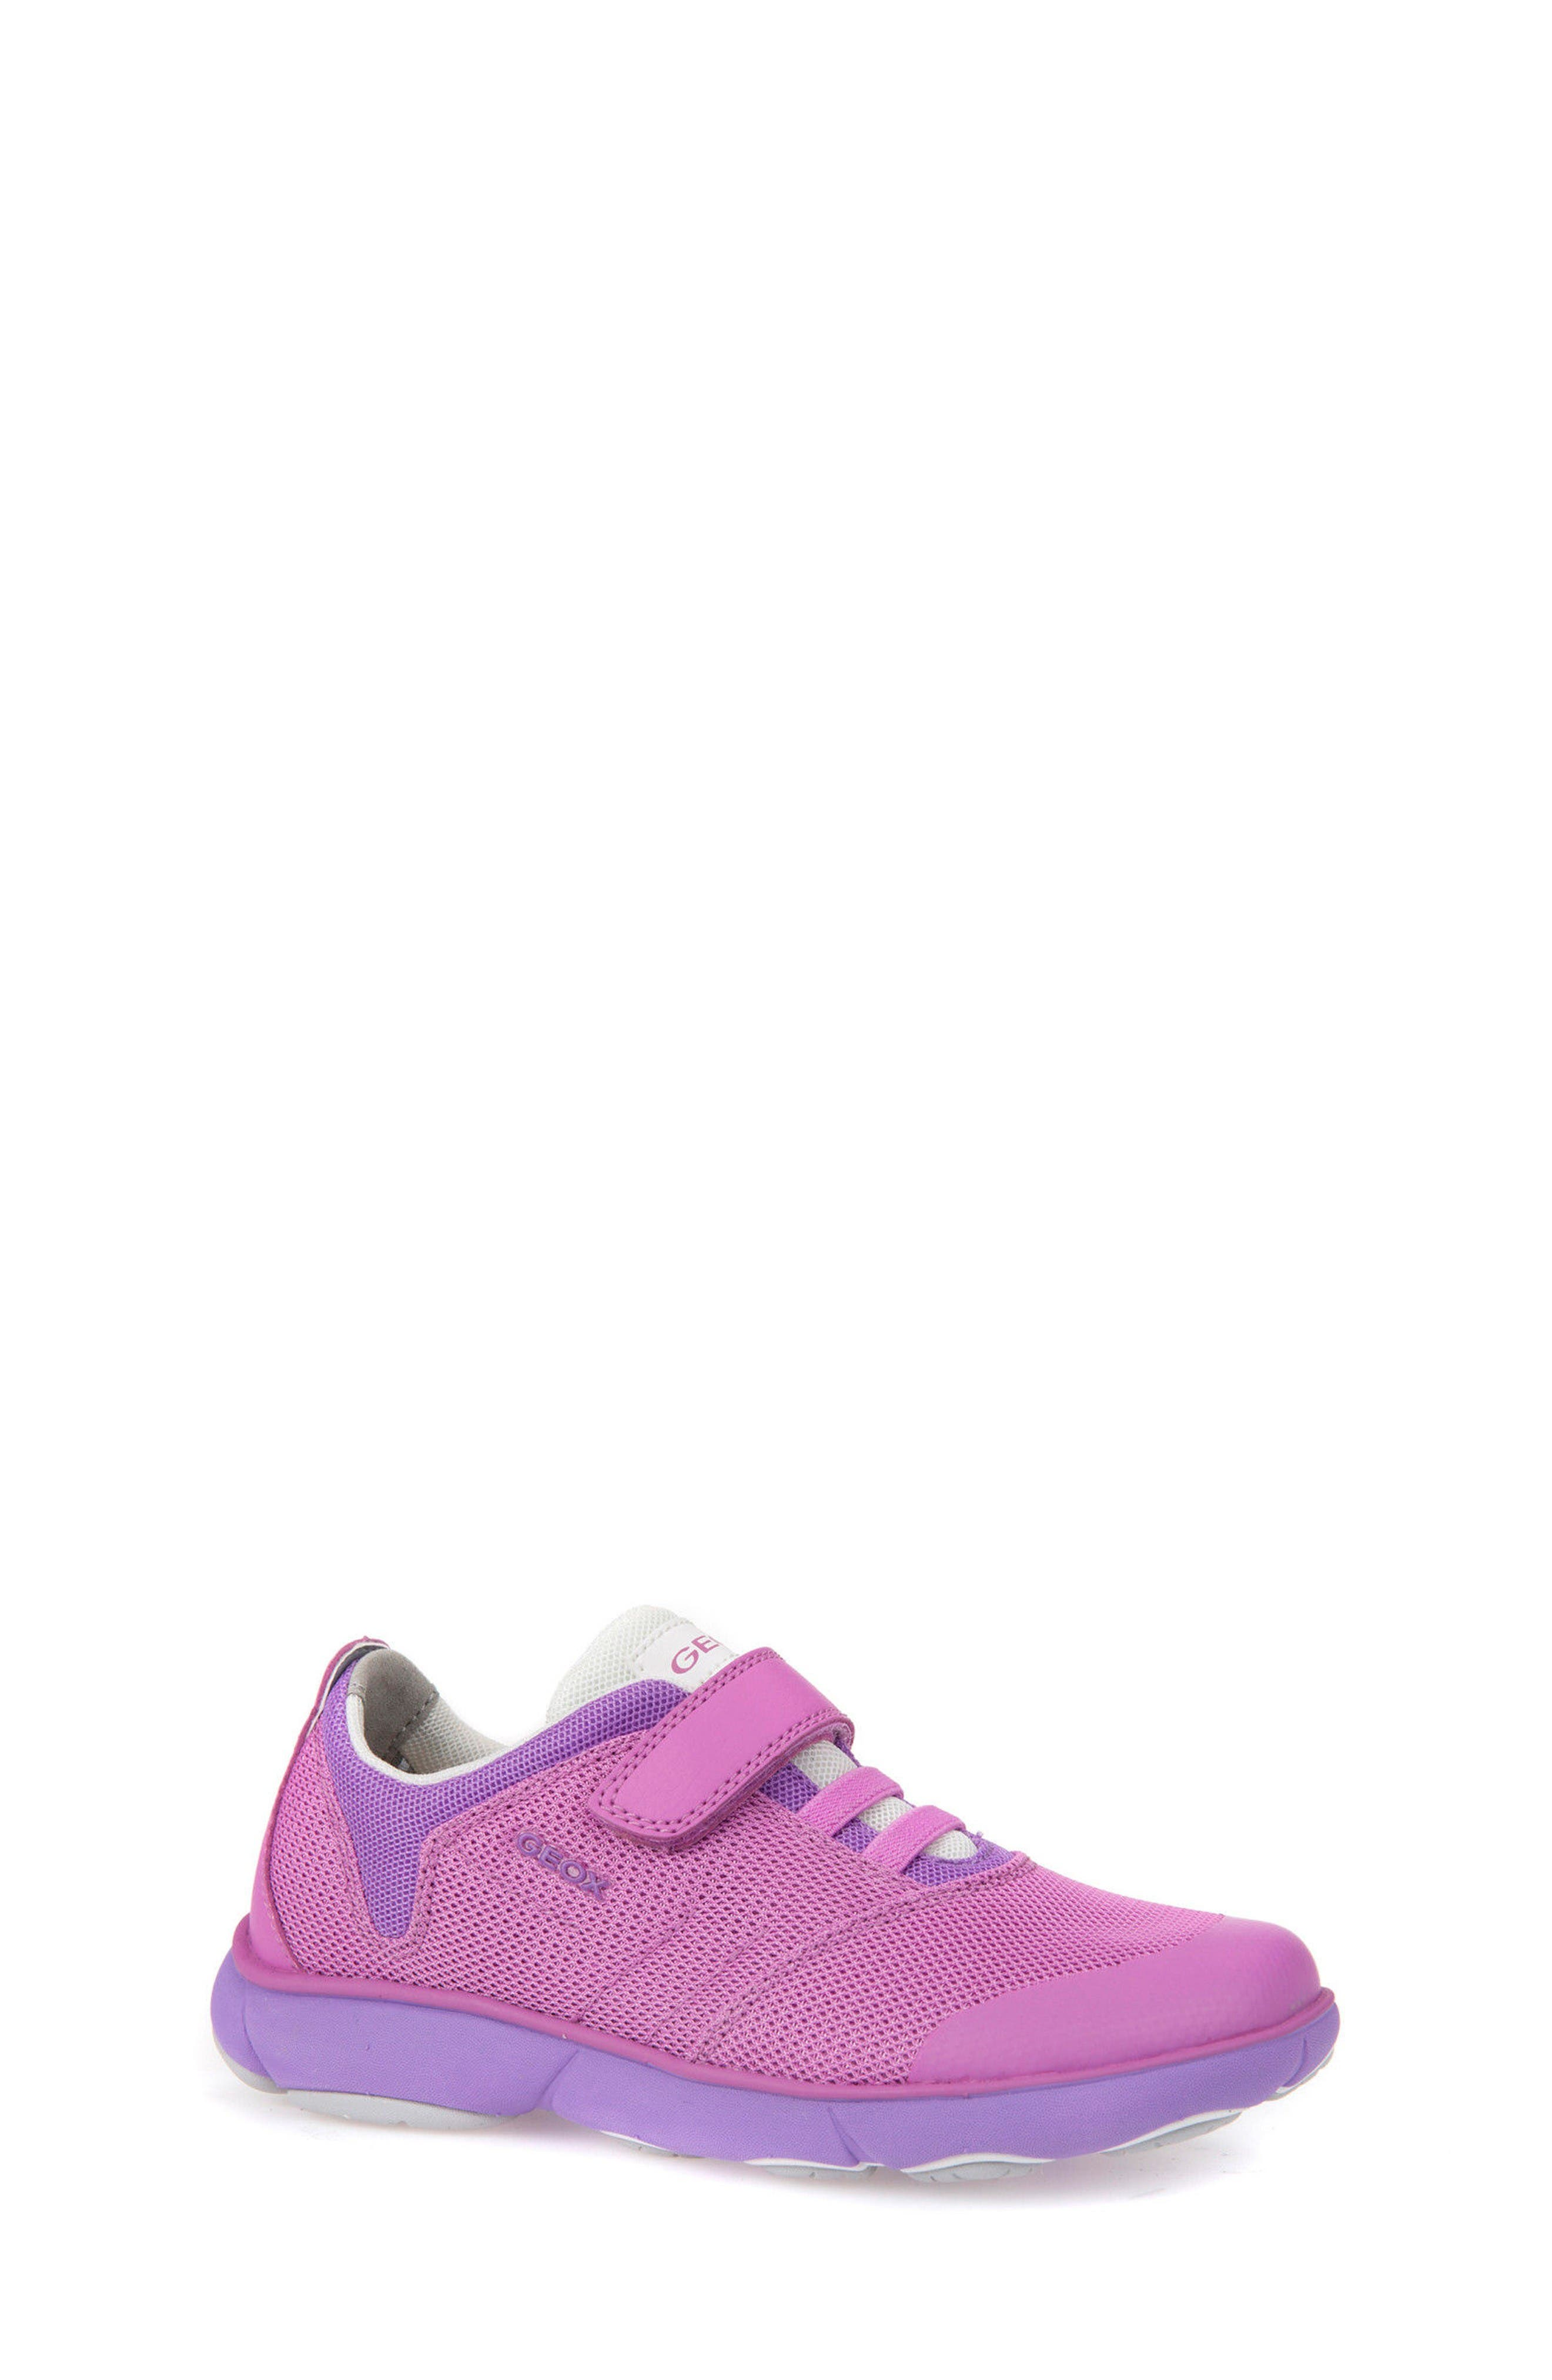 Jr Nebula Sneaker,                             Main thumbnail 1, color,                             Fuchsia